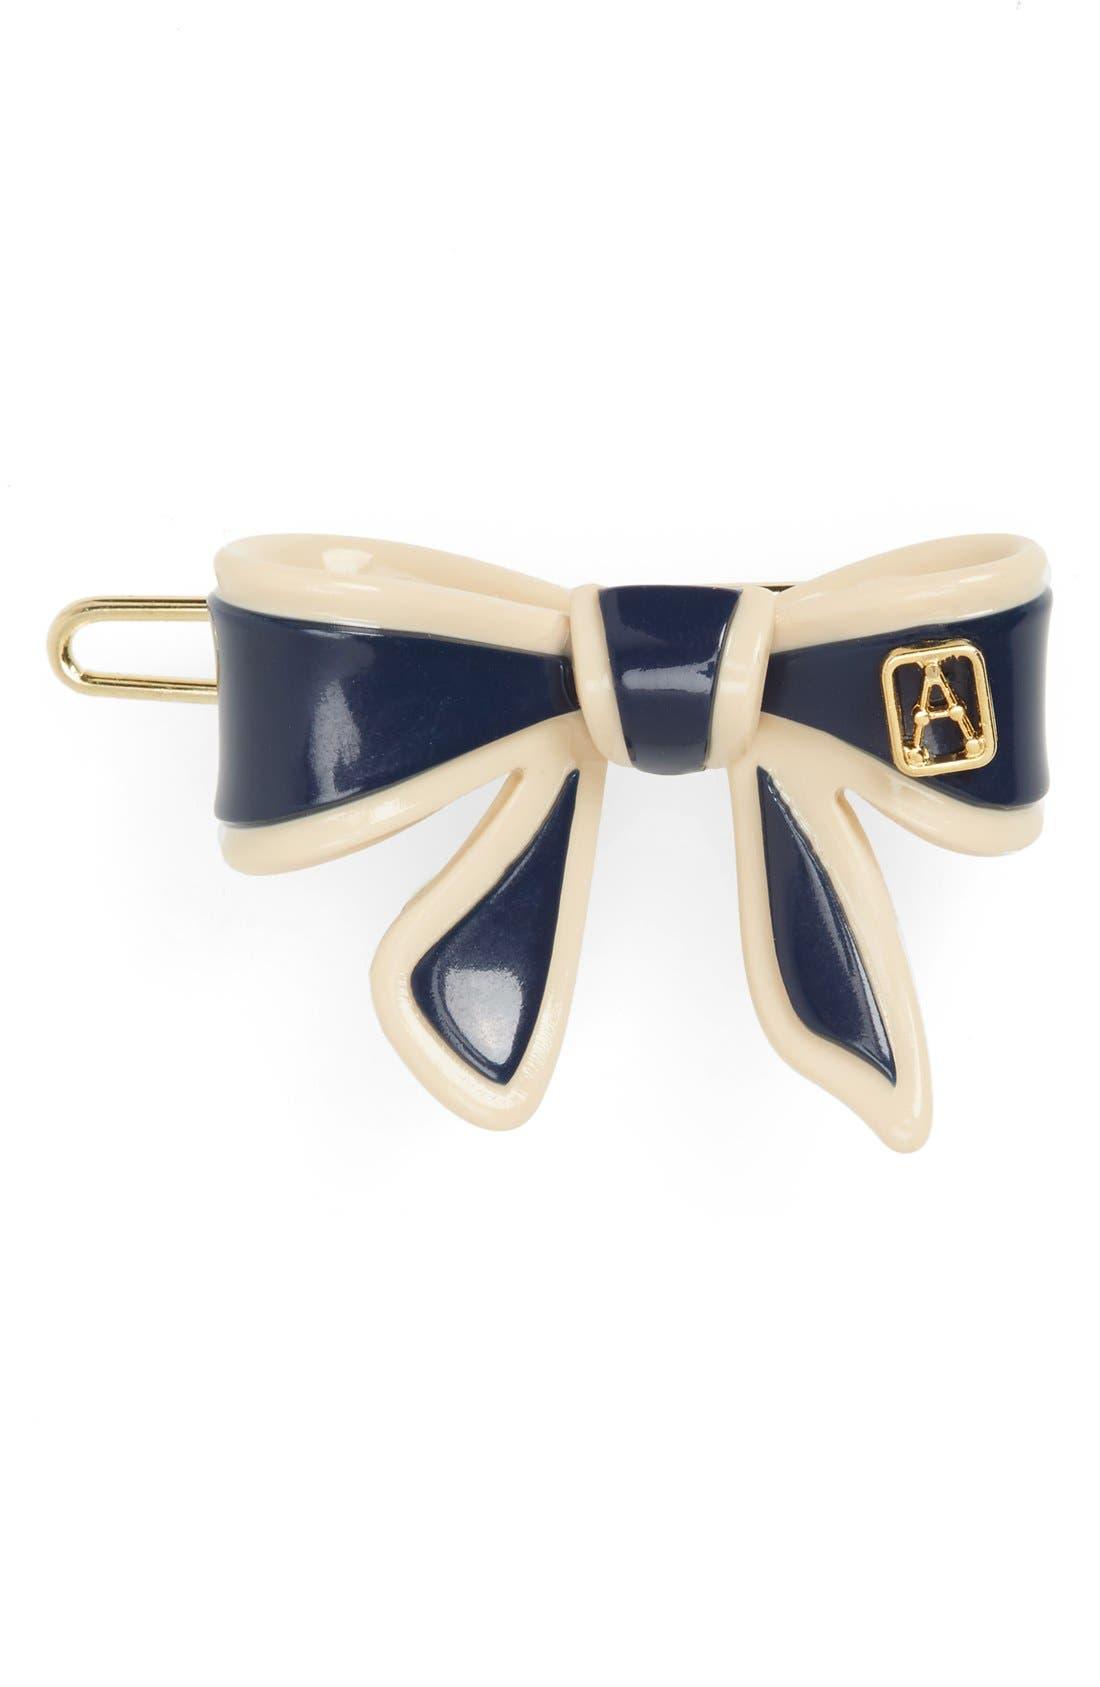 Alternate Image 1 Selected - Alexandre de Paris 'Mini Tenderly' Bow Barrette